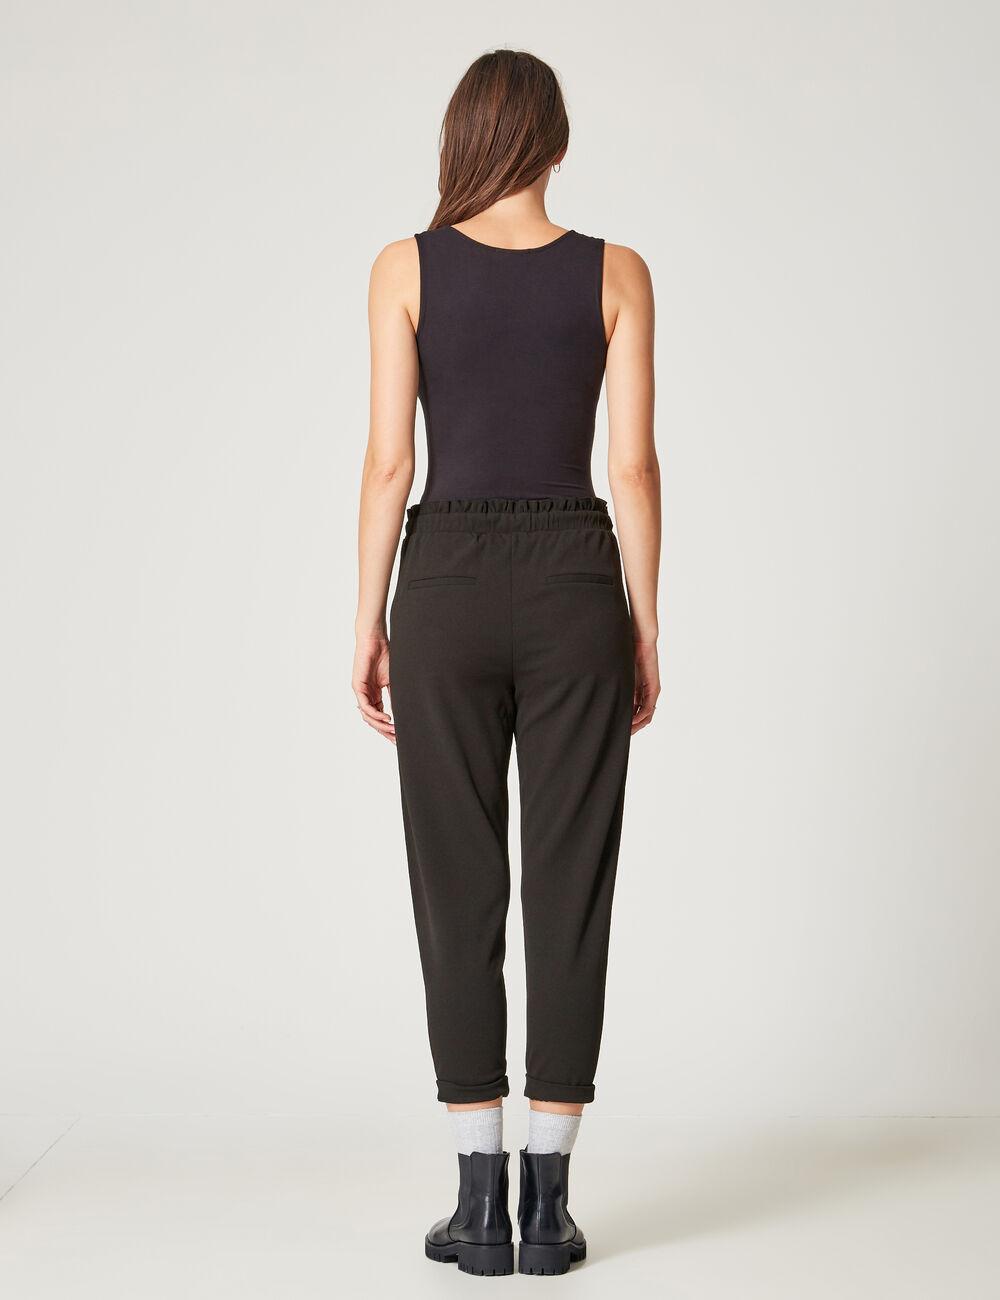 pantalon fluide avec fronces noir femme jennyfer. Black Bedroom Furniture Sets. Home Design Ideas